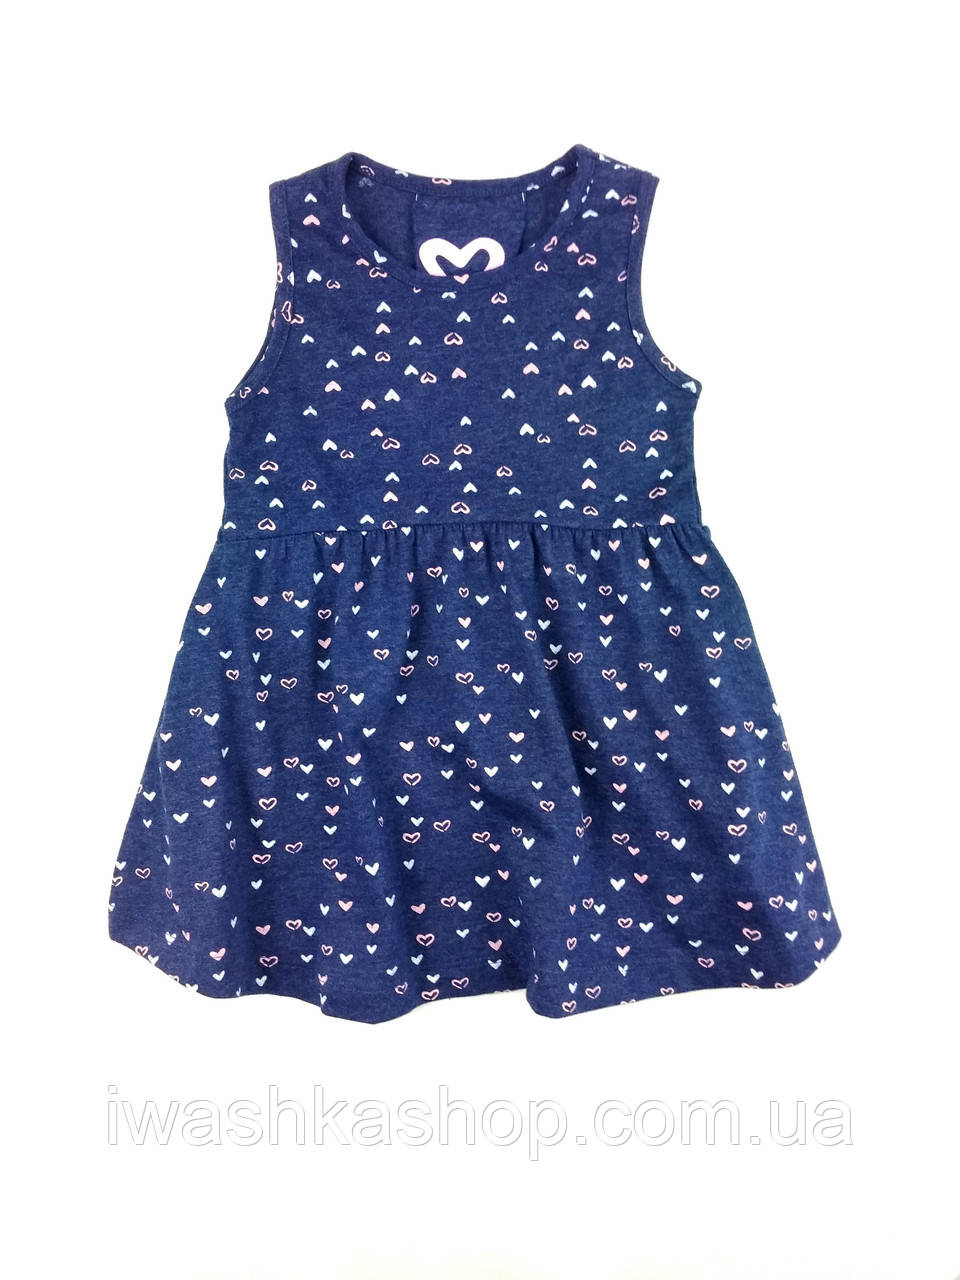 Летний синий сарафан в сердечки на девочек 6 - 7 лет, р. 122, Young Dimension by Primark